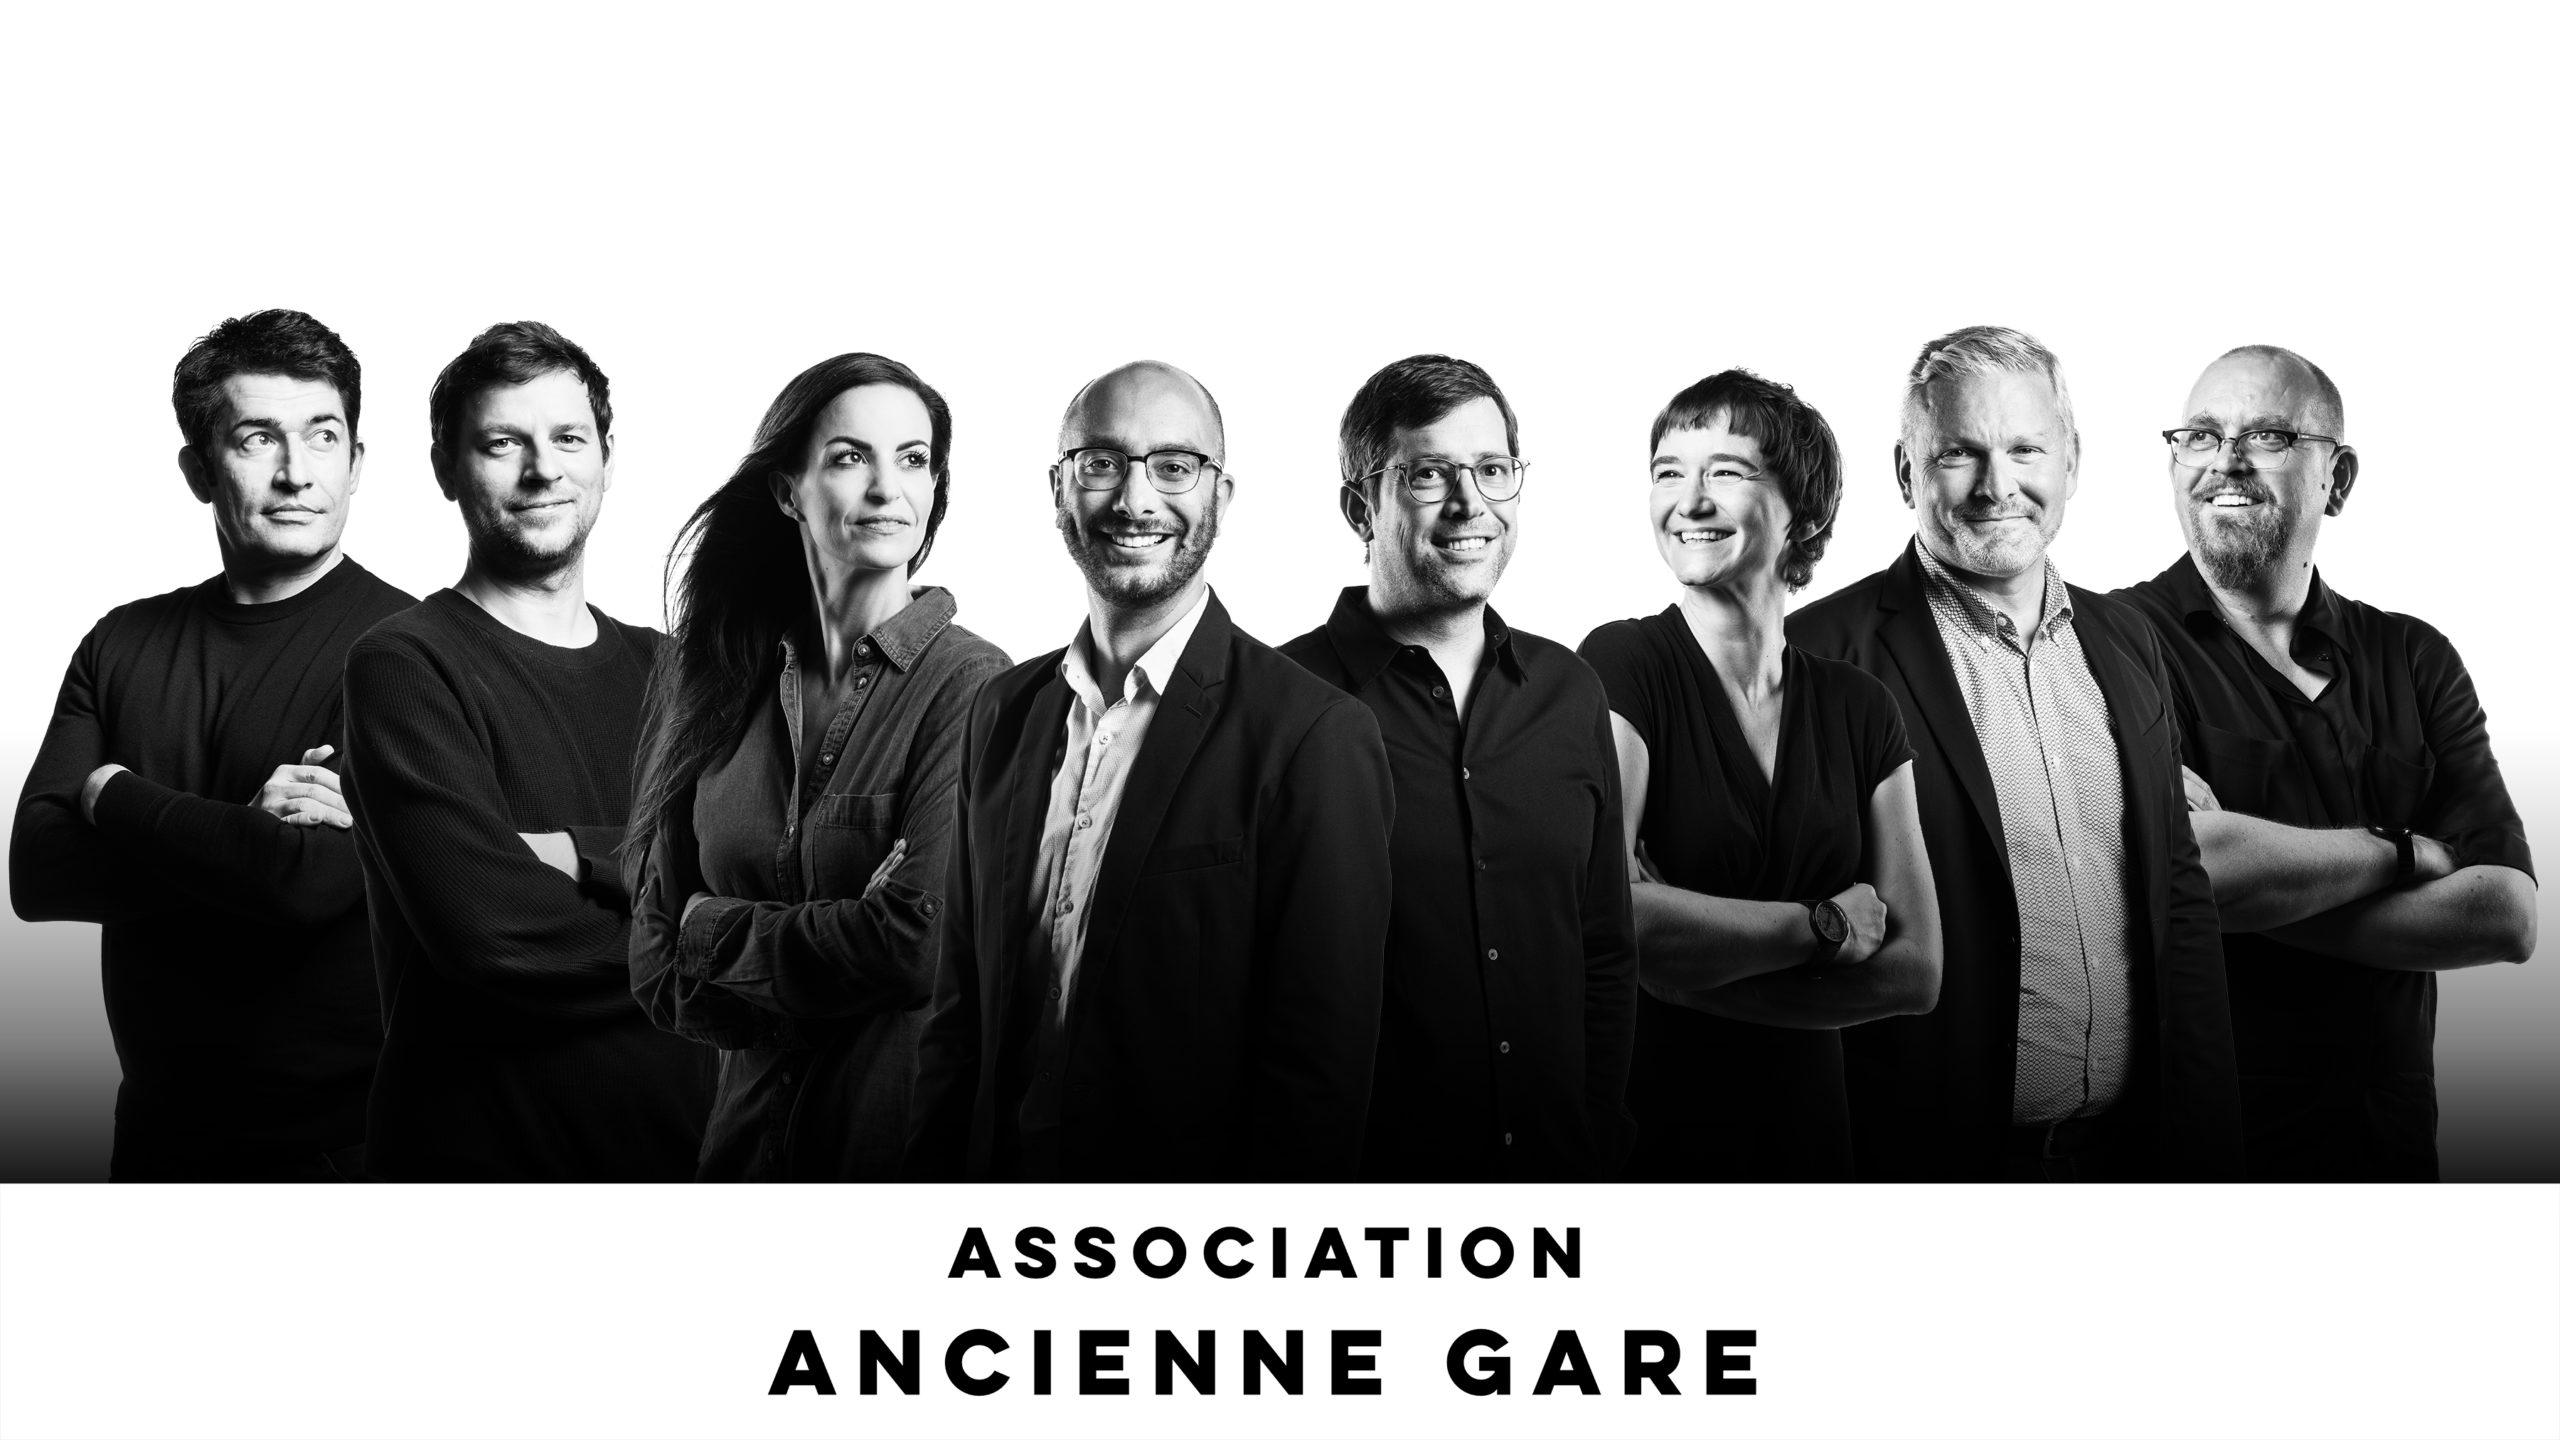 Comité Association Ancienne Gare AAG by STEMUTZ, bluefactory, 17.09.2020